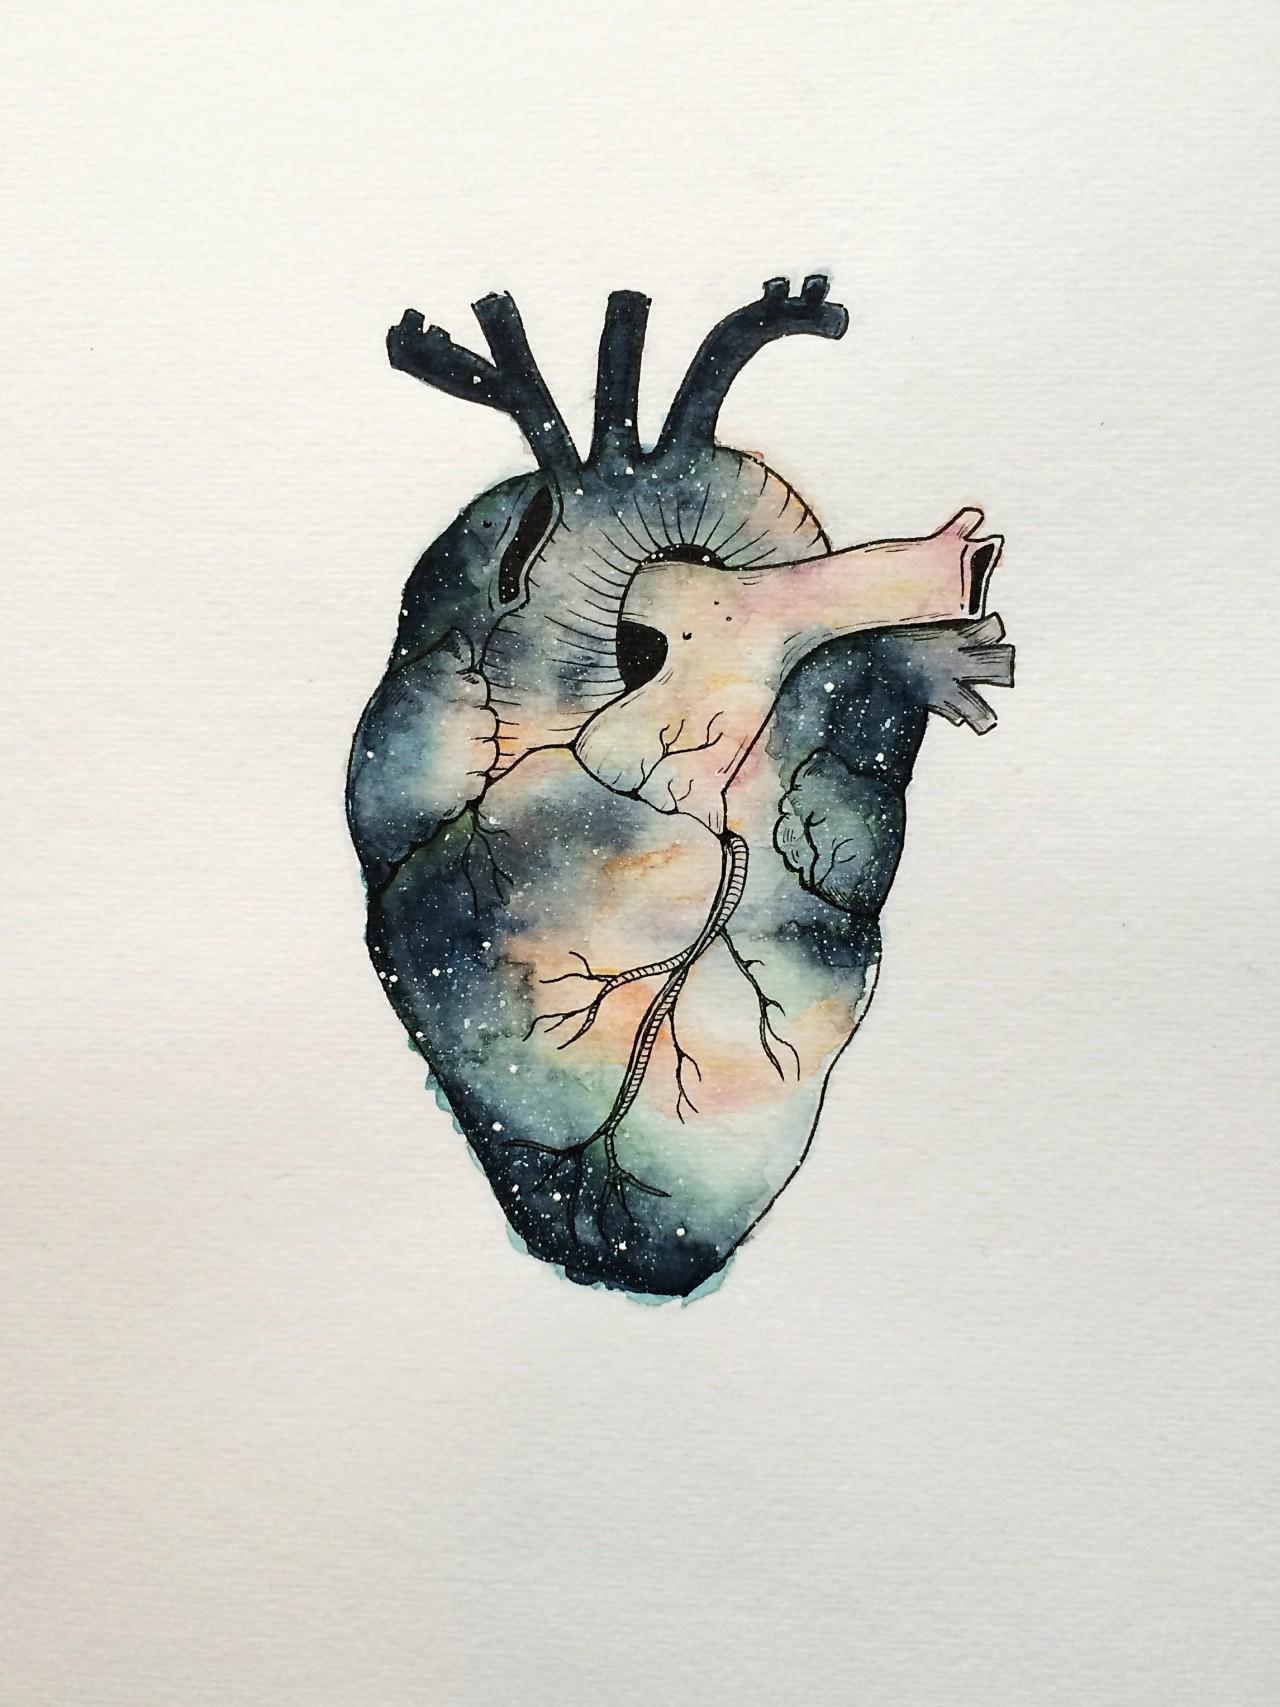 1280x1707 Pin By Virginia P. On Artie Anatomy, Human Anatomy